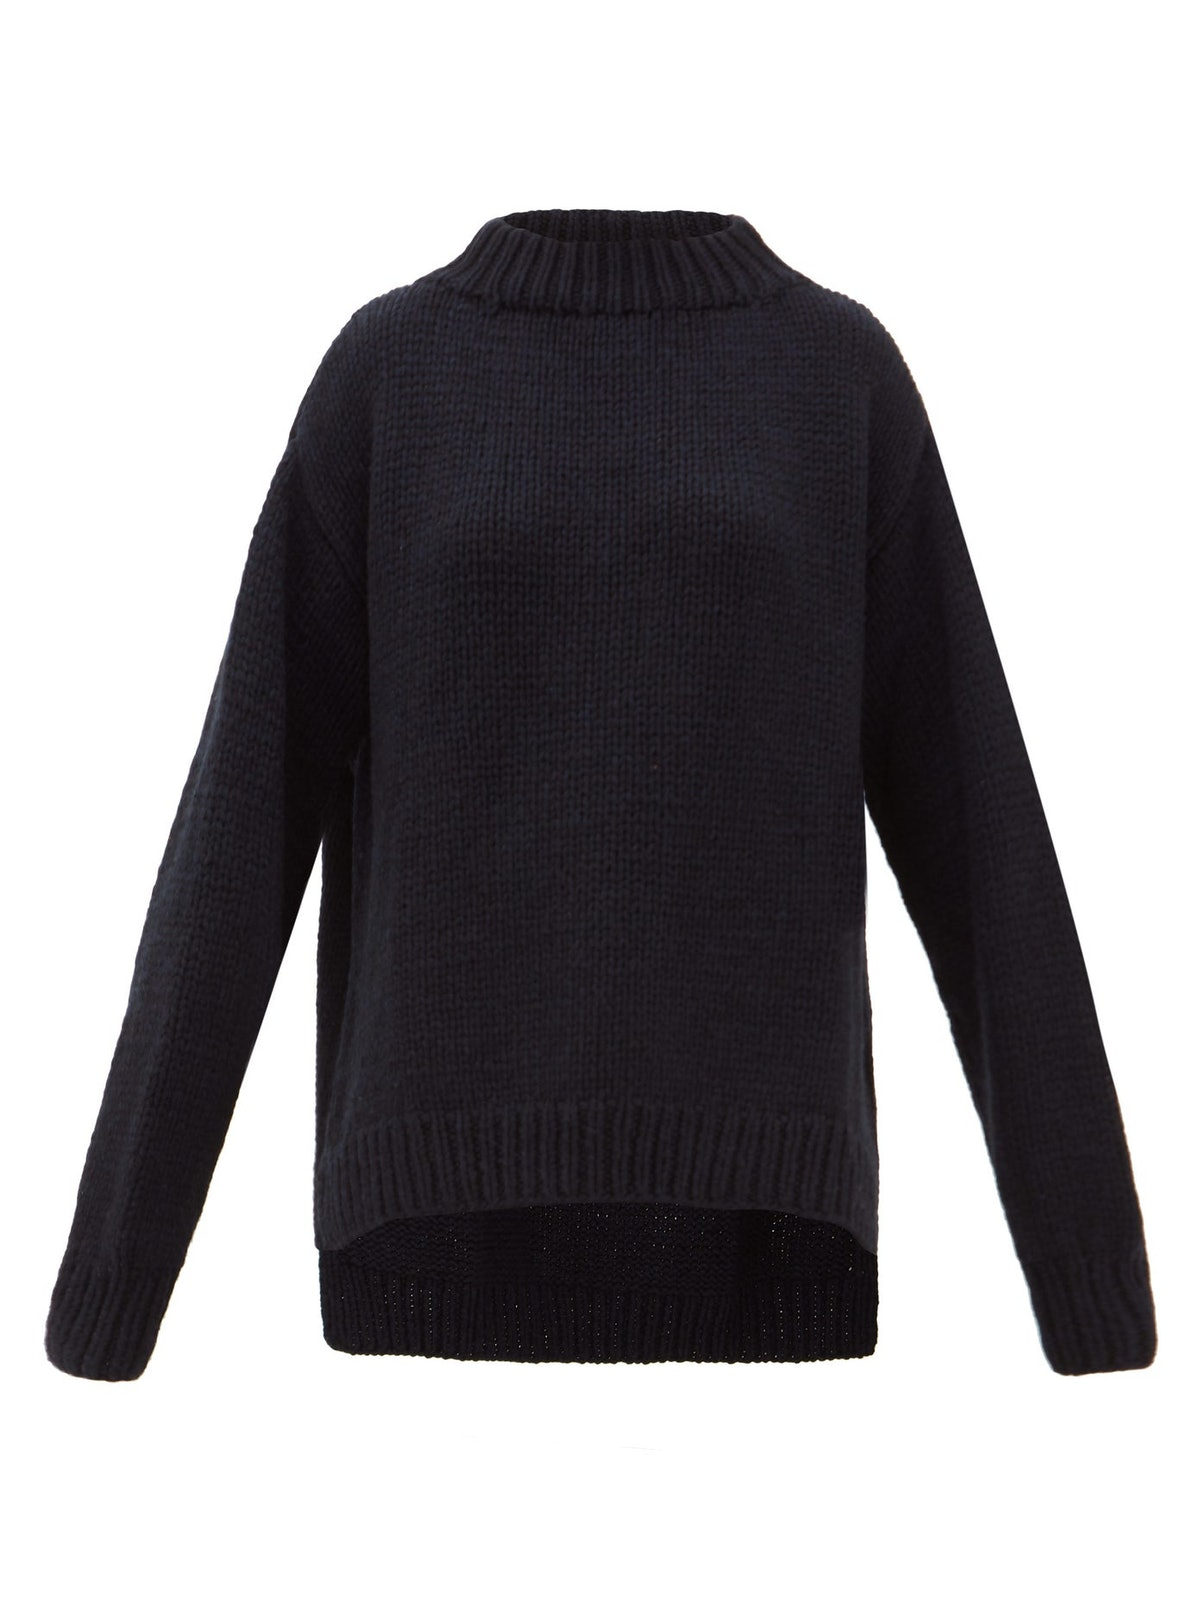 Oversized Chunky-Knit Cashmere Sweater